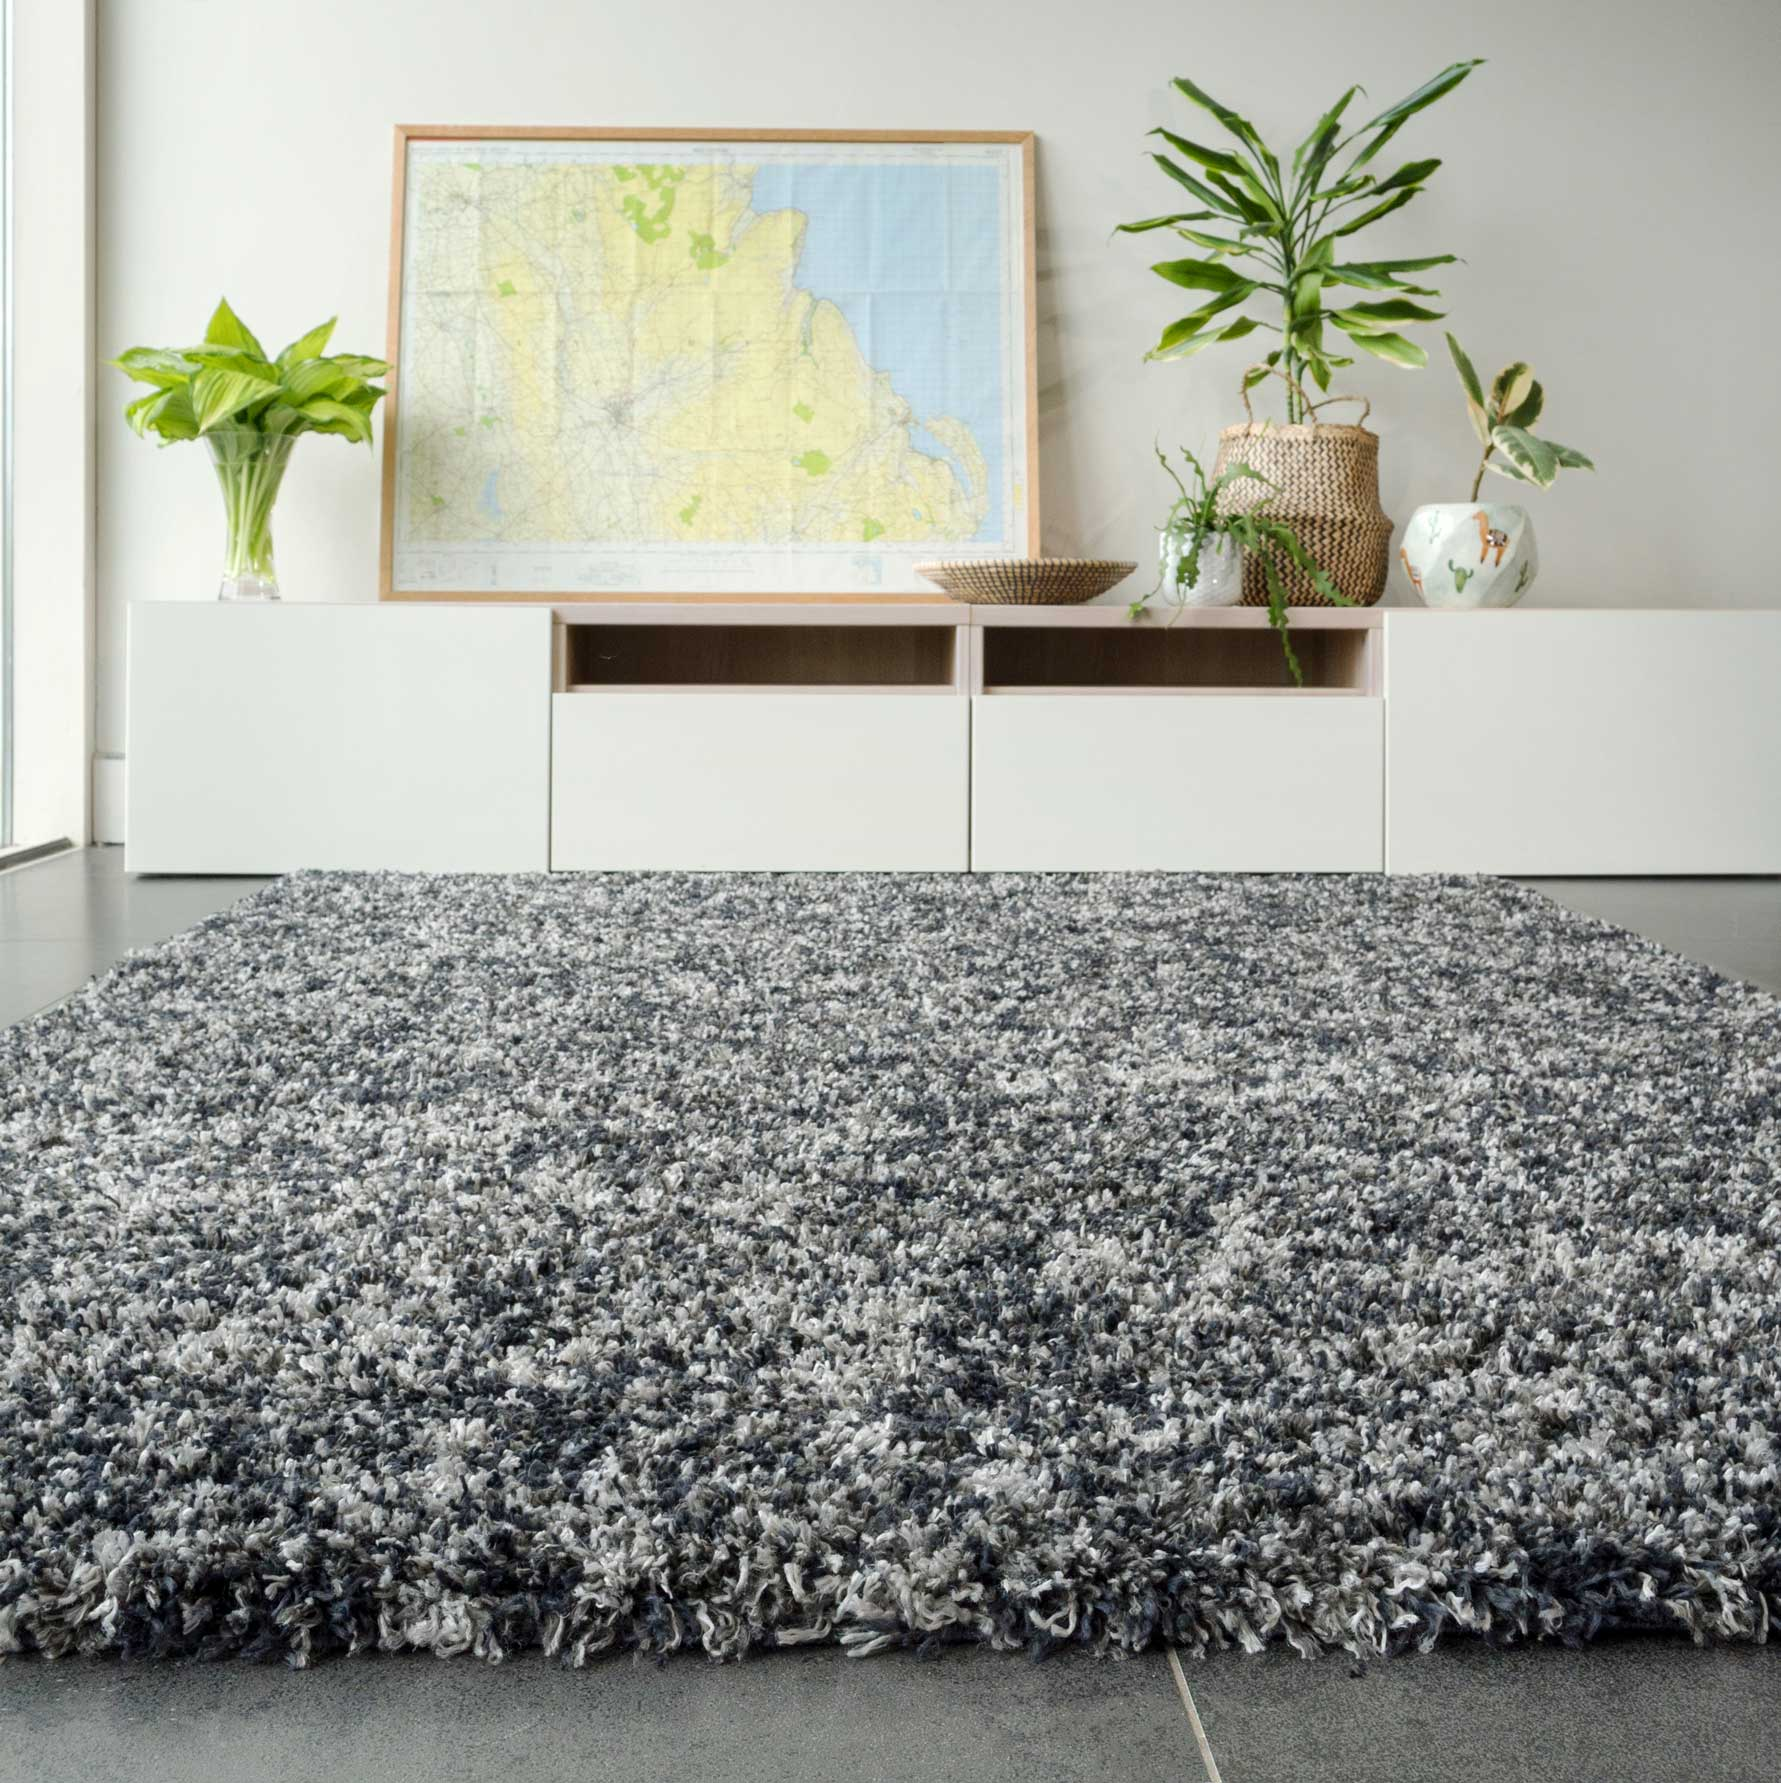 Soft Mottled Grey Shaggy Area Rug | Camberley